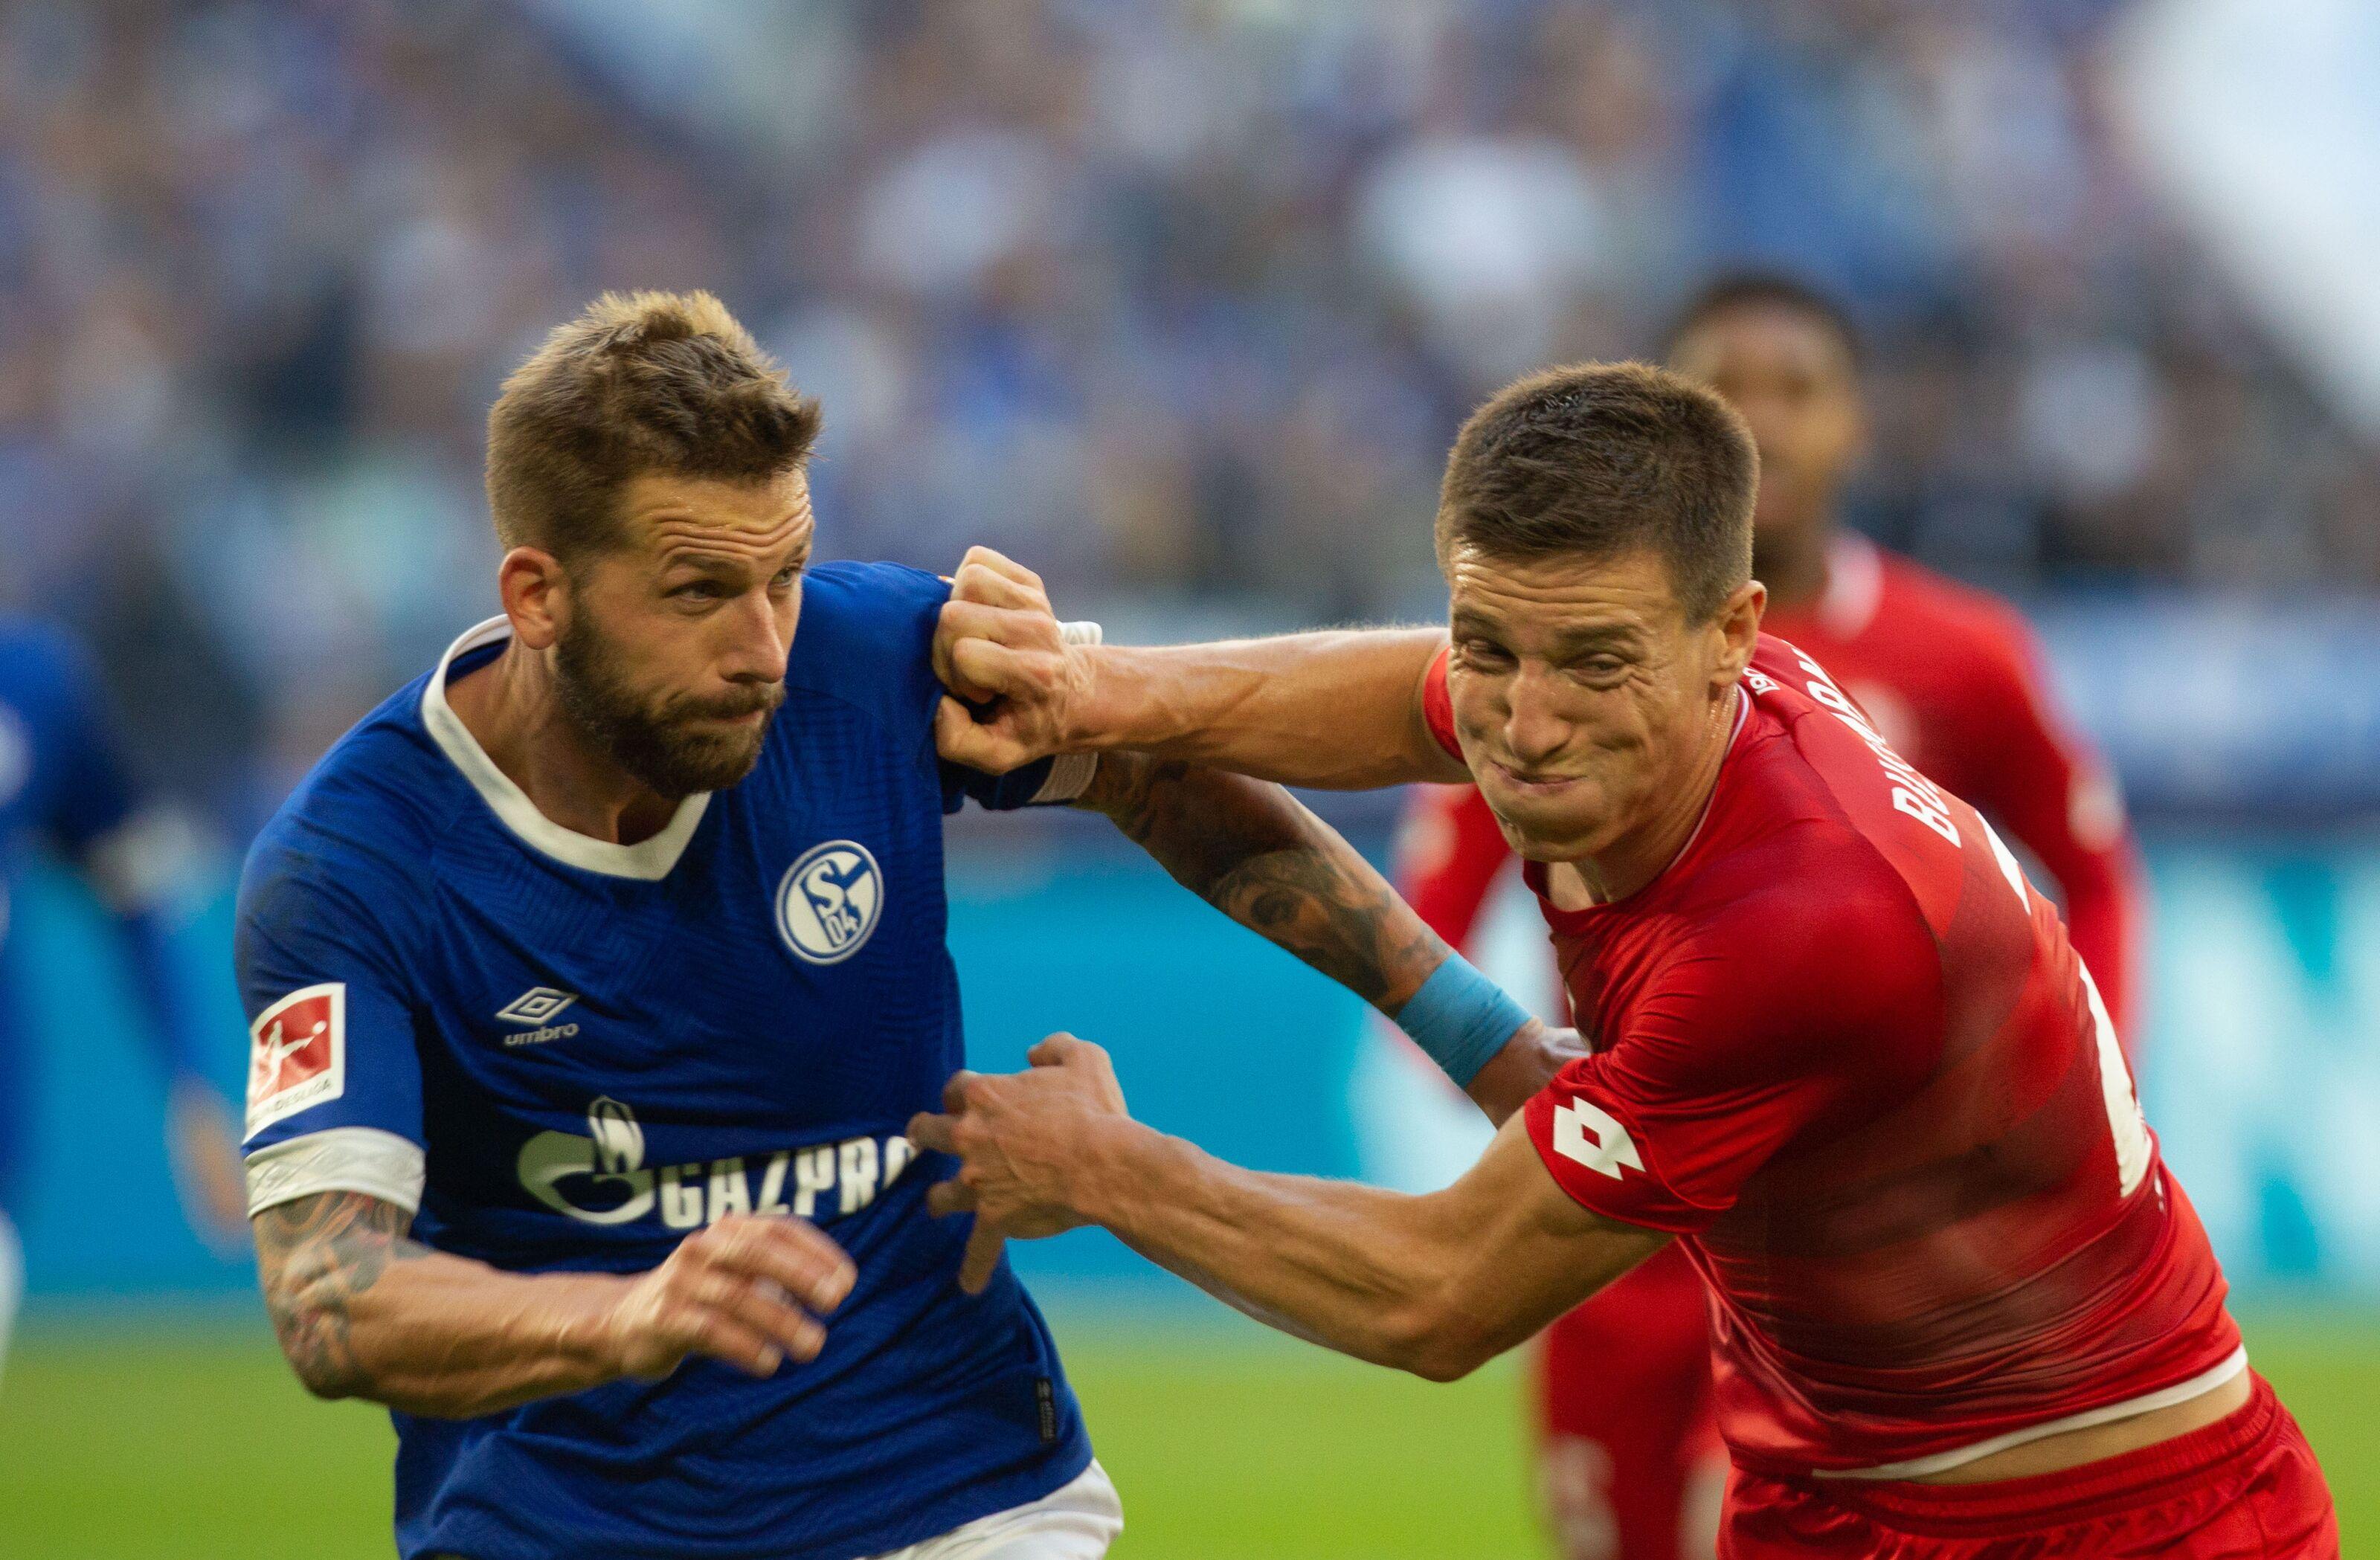 Schalke Live Stream Watch Champions League Online